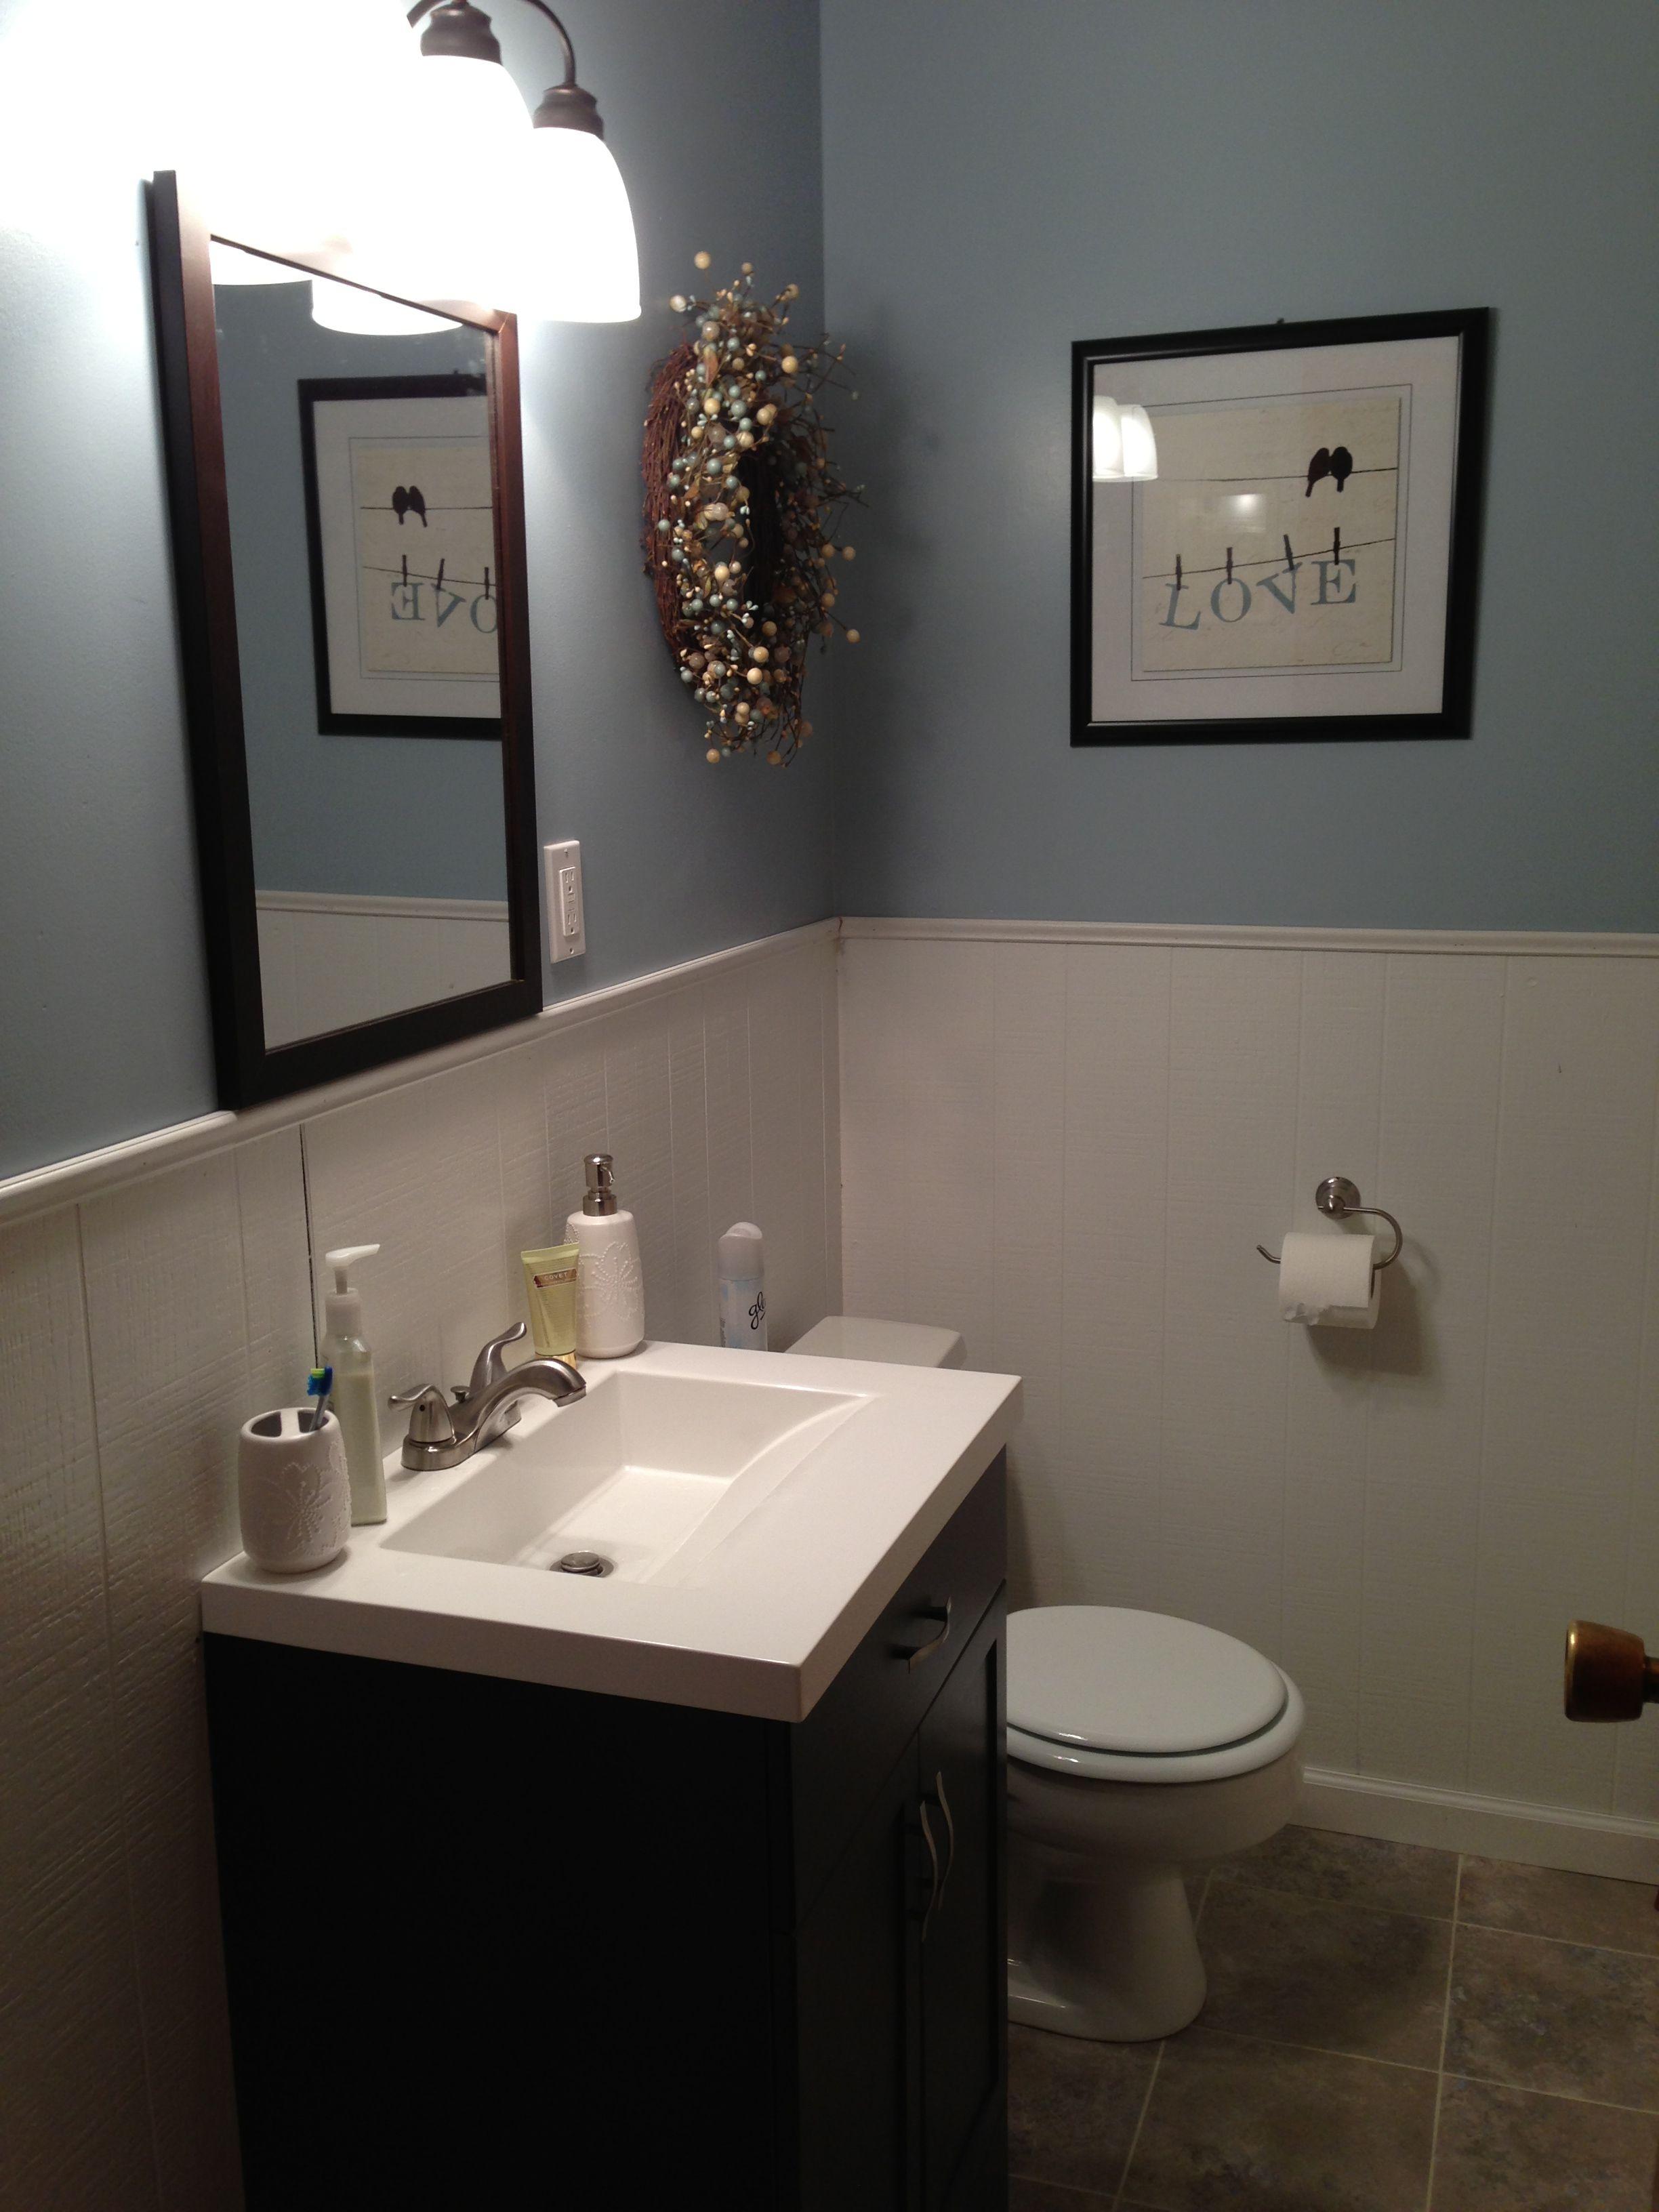 New bathroom!! Budget: $480. Includes floor, paint, trim, vanity, mirror, bathtub facet, vanity facet, and shower curtain!!